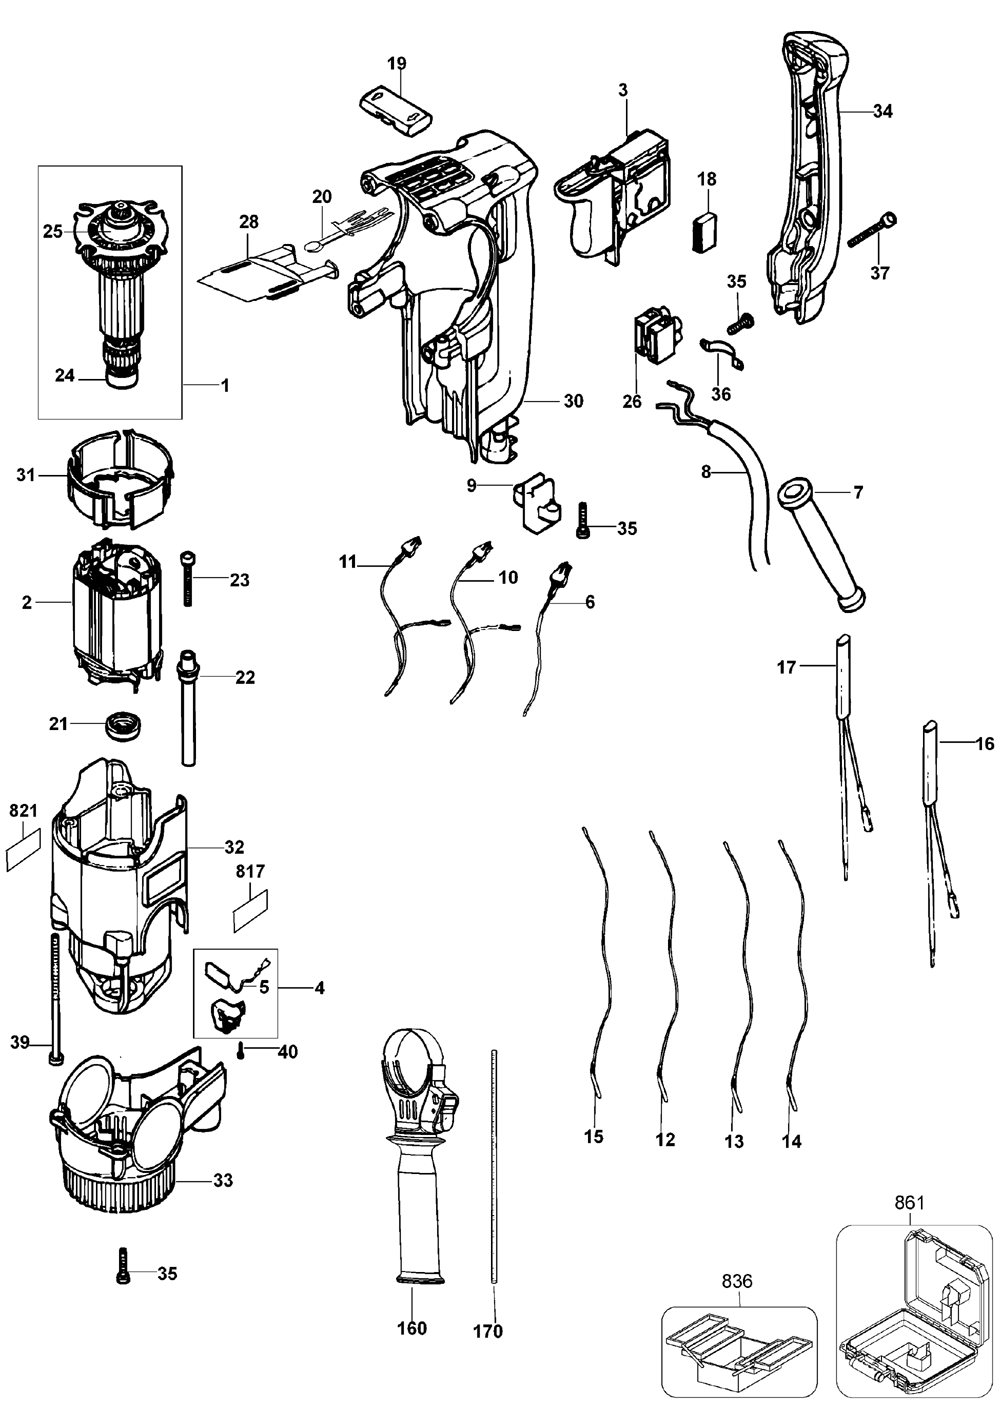 dewalt hammer drill wiring diagram de walt cordless hammer drills  u2022 138dhw co